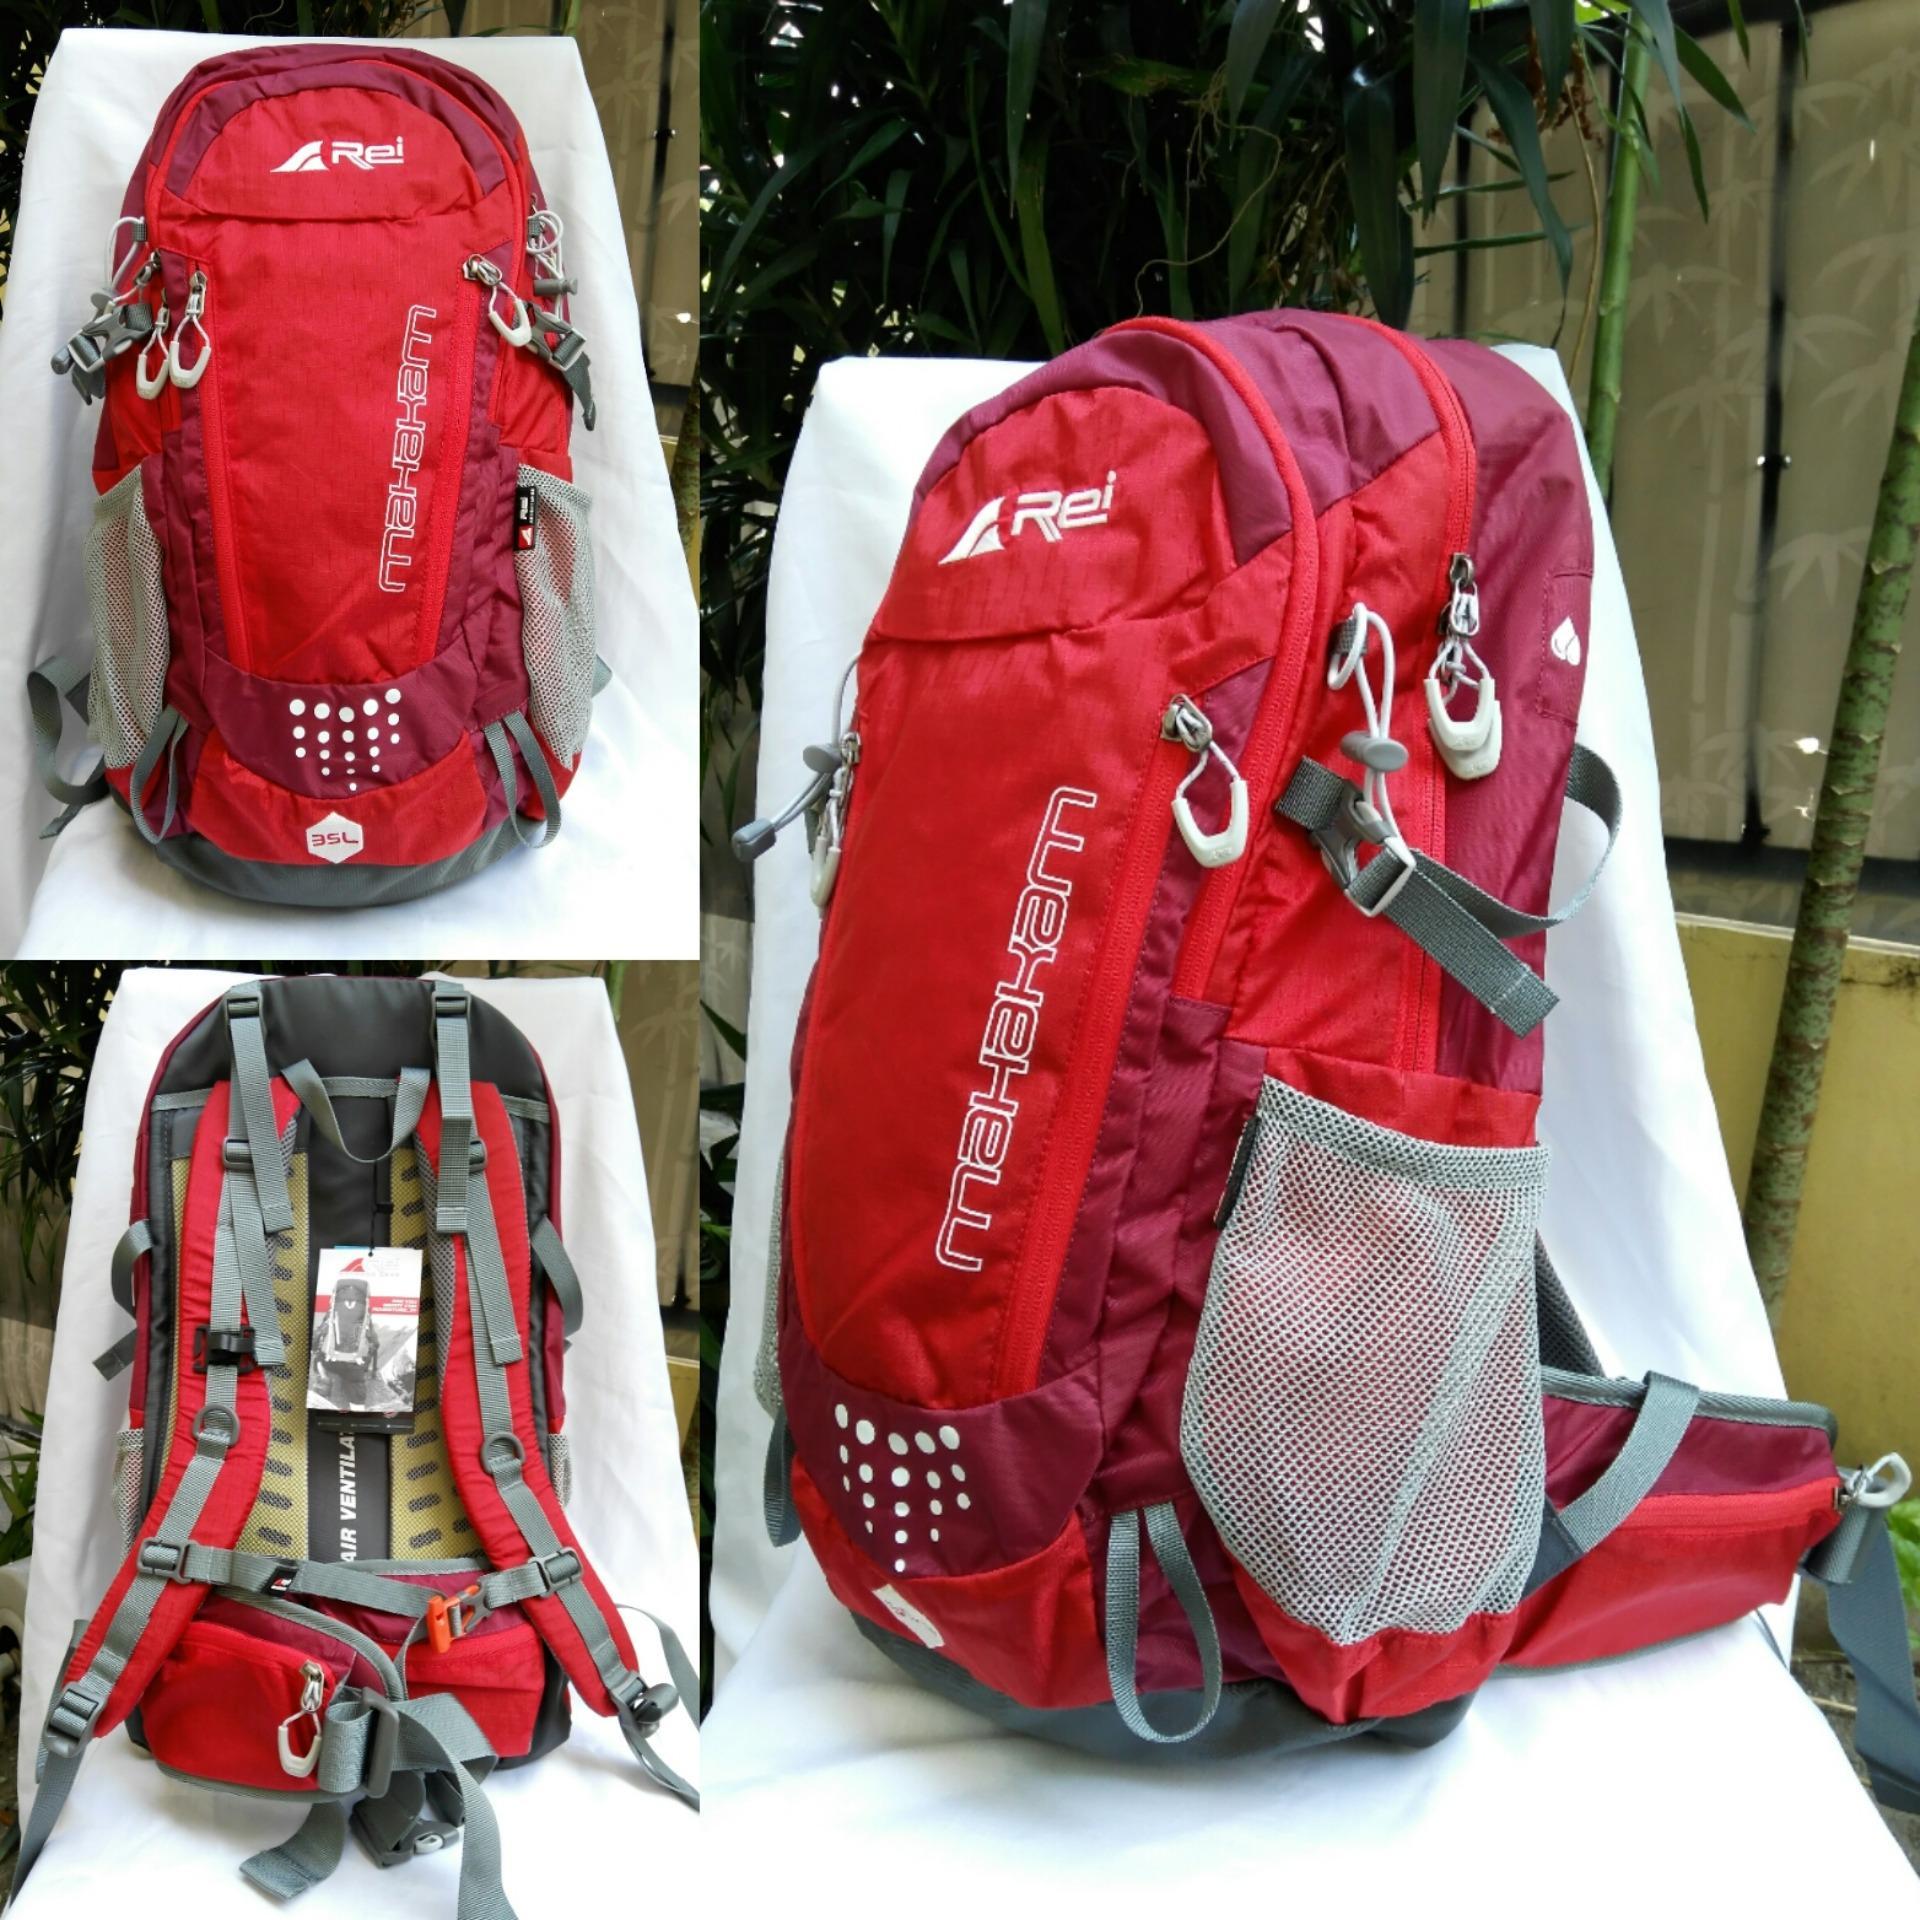 Cek Harga Baru Royal Mountain 9428 Tas Ransel 40 Liter Free Rain Kamera Backpack Medium Nikon Gunung Bacpack Daypack Laptop Outdoor 35 L Rei